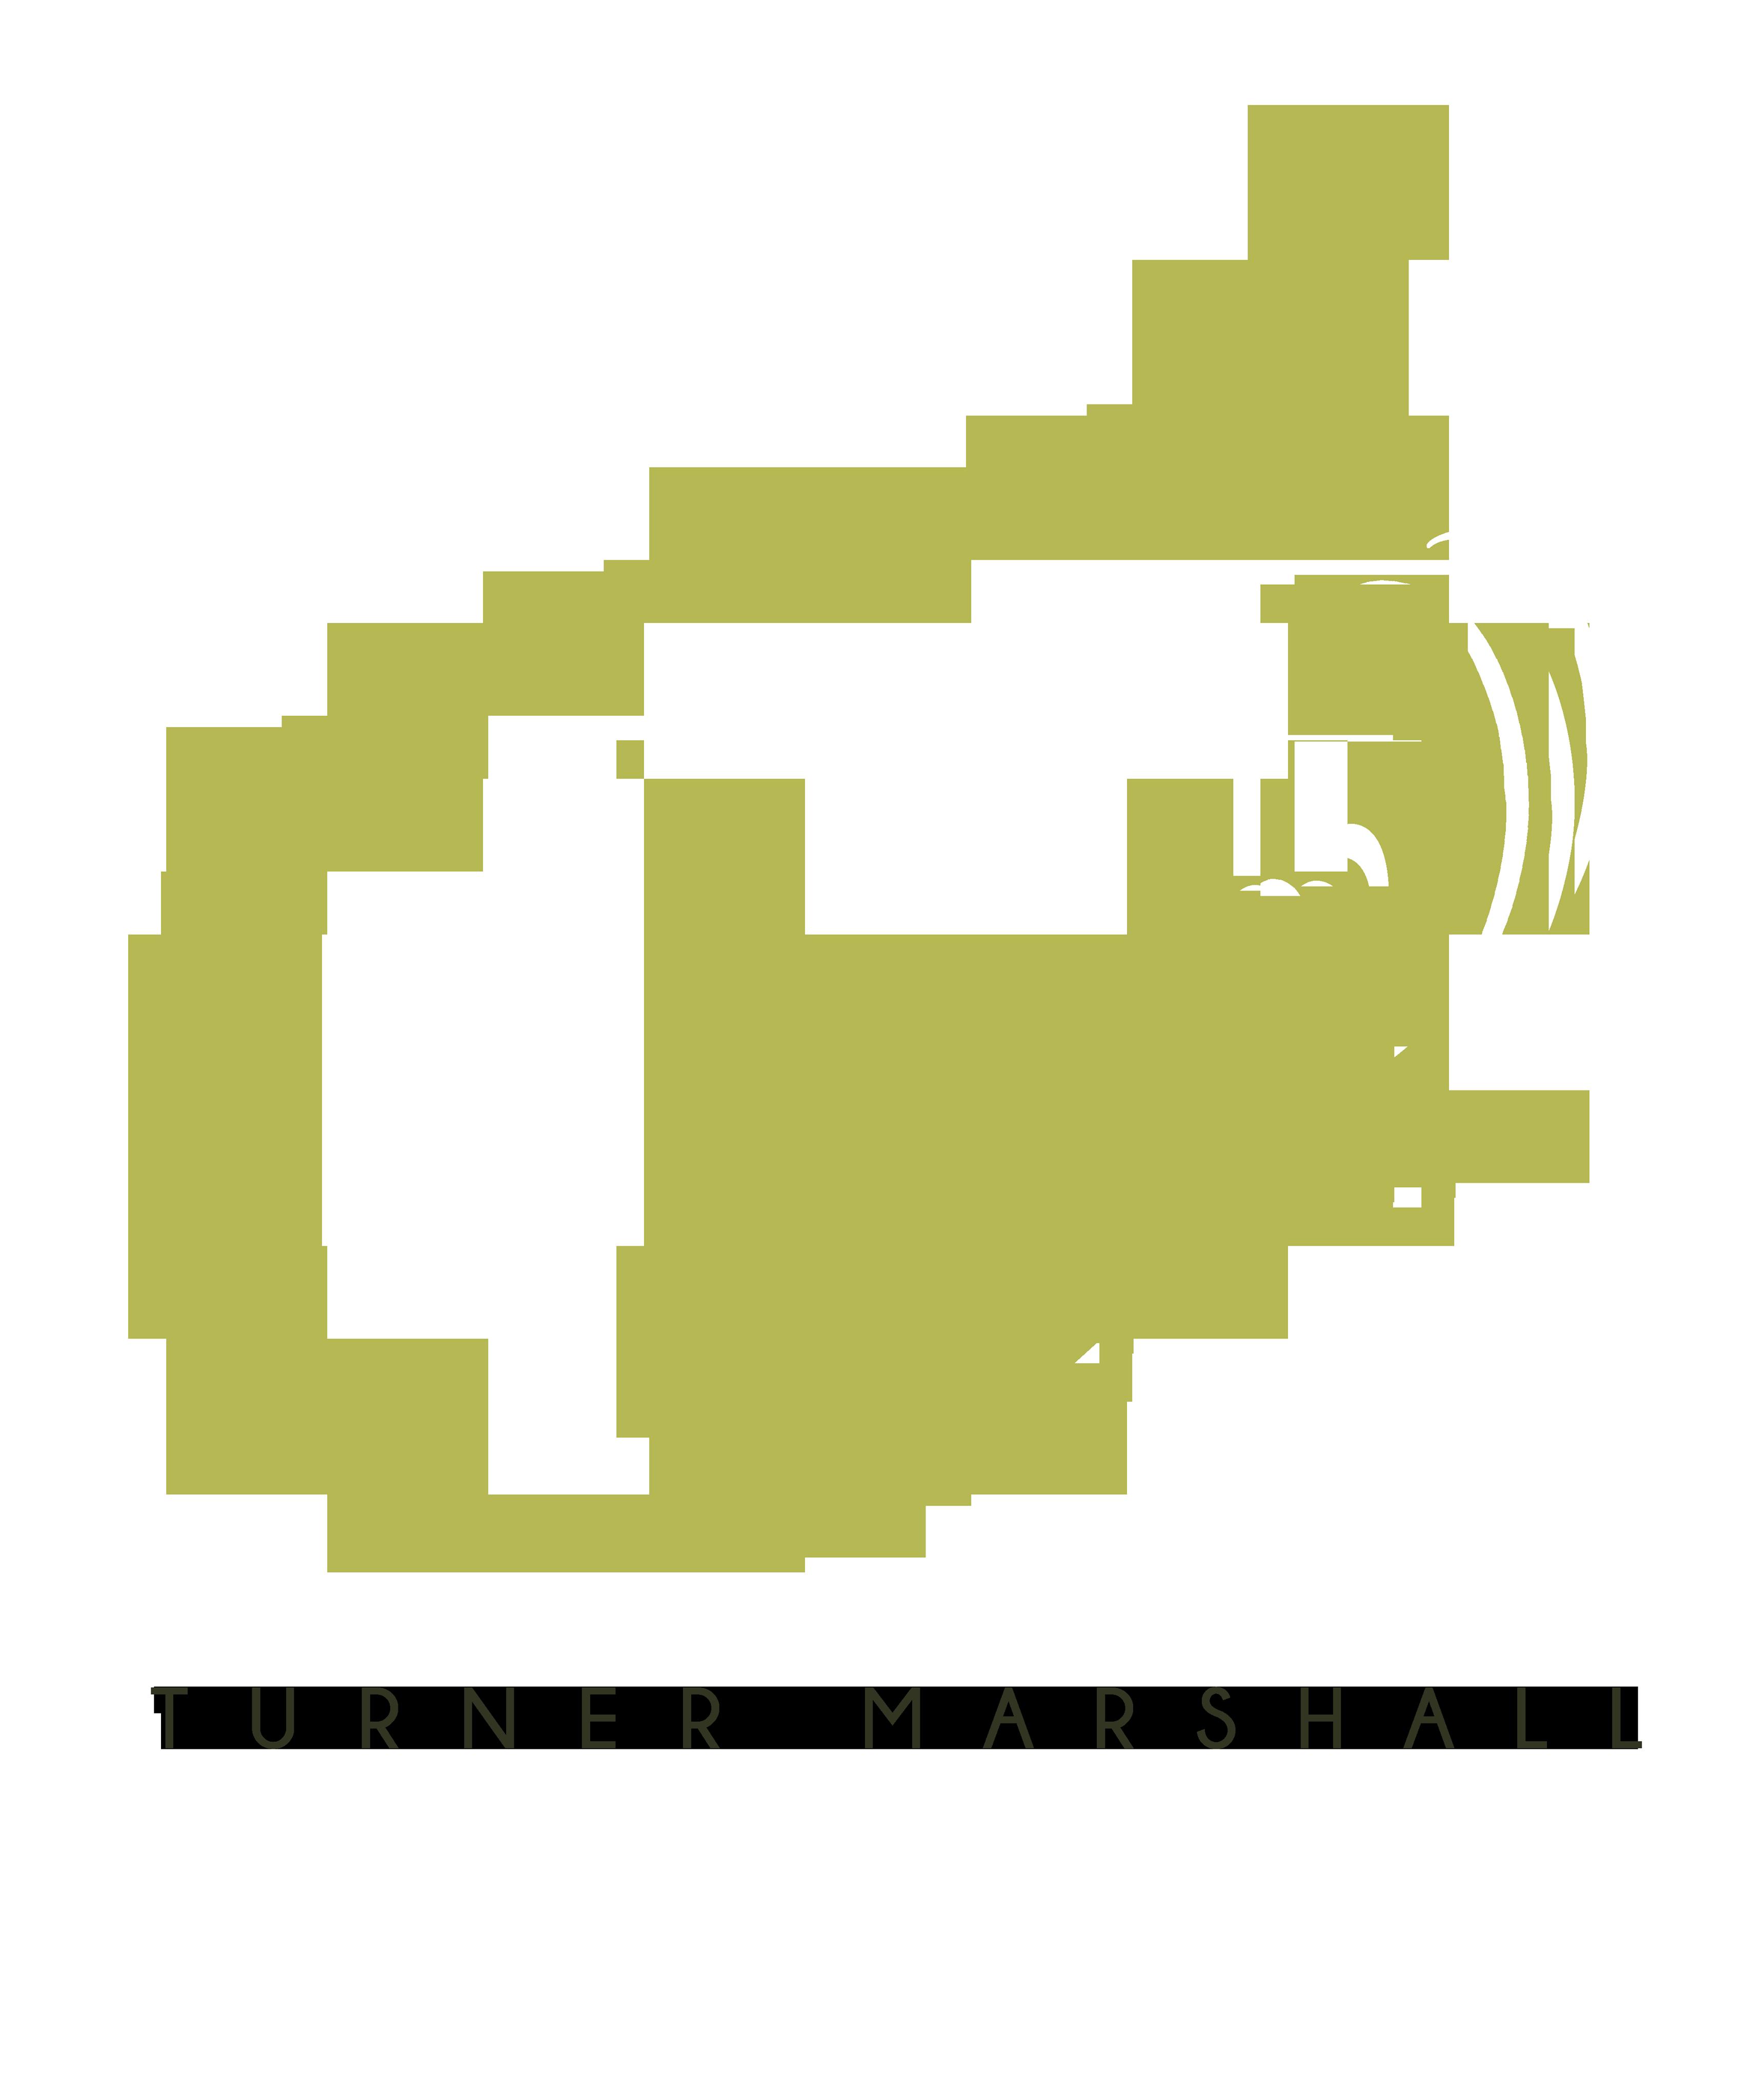 Clare Turner-Marshall